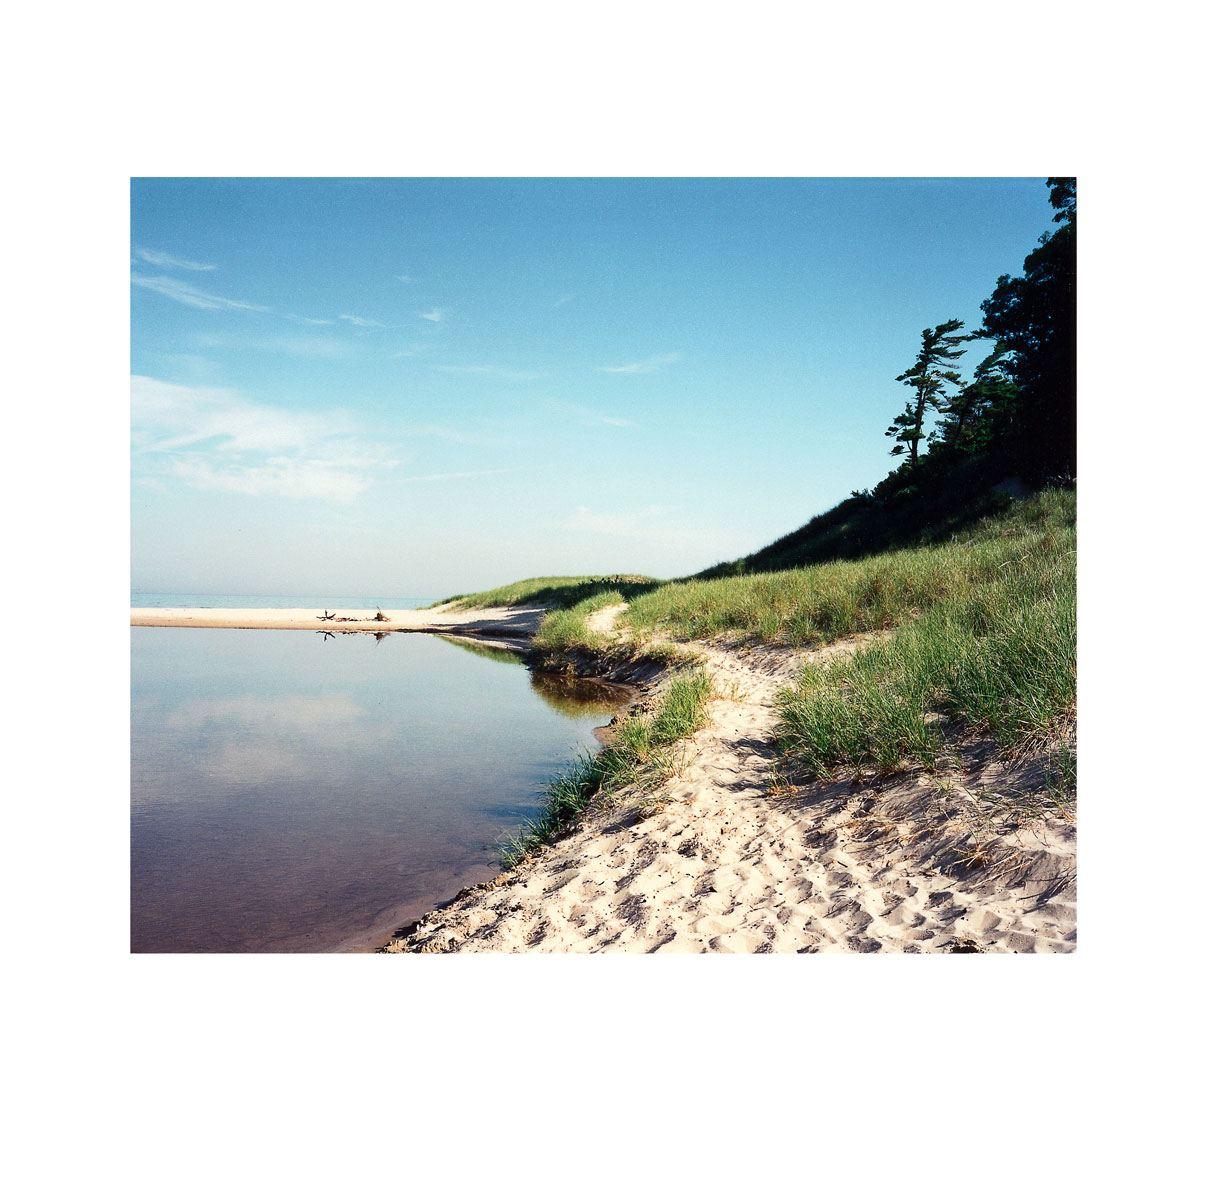 """Bass Lake Outlet"" | Village Portrait | Pentwater, Michigan, USA | 1996"